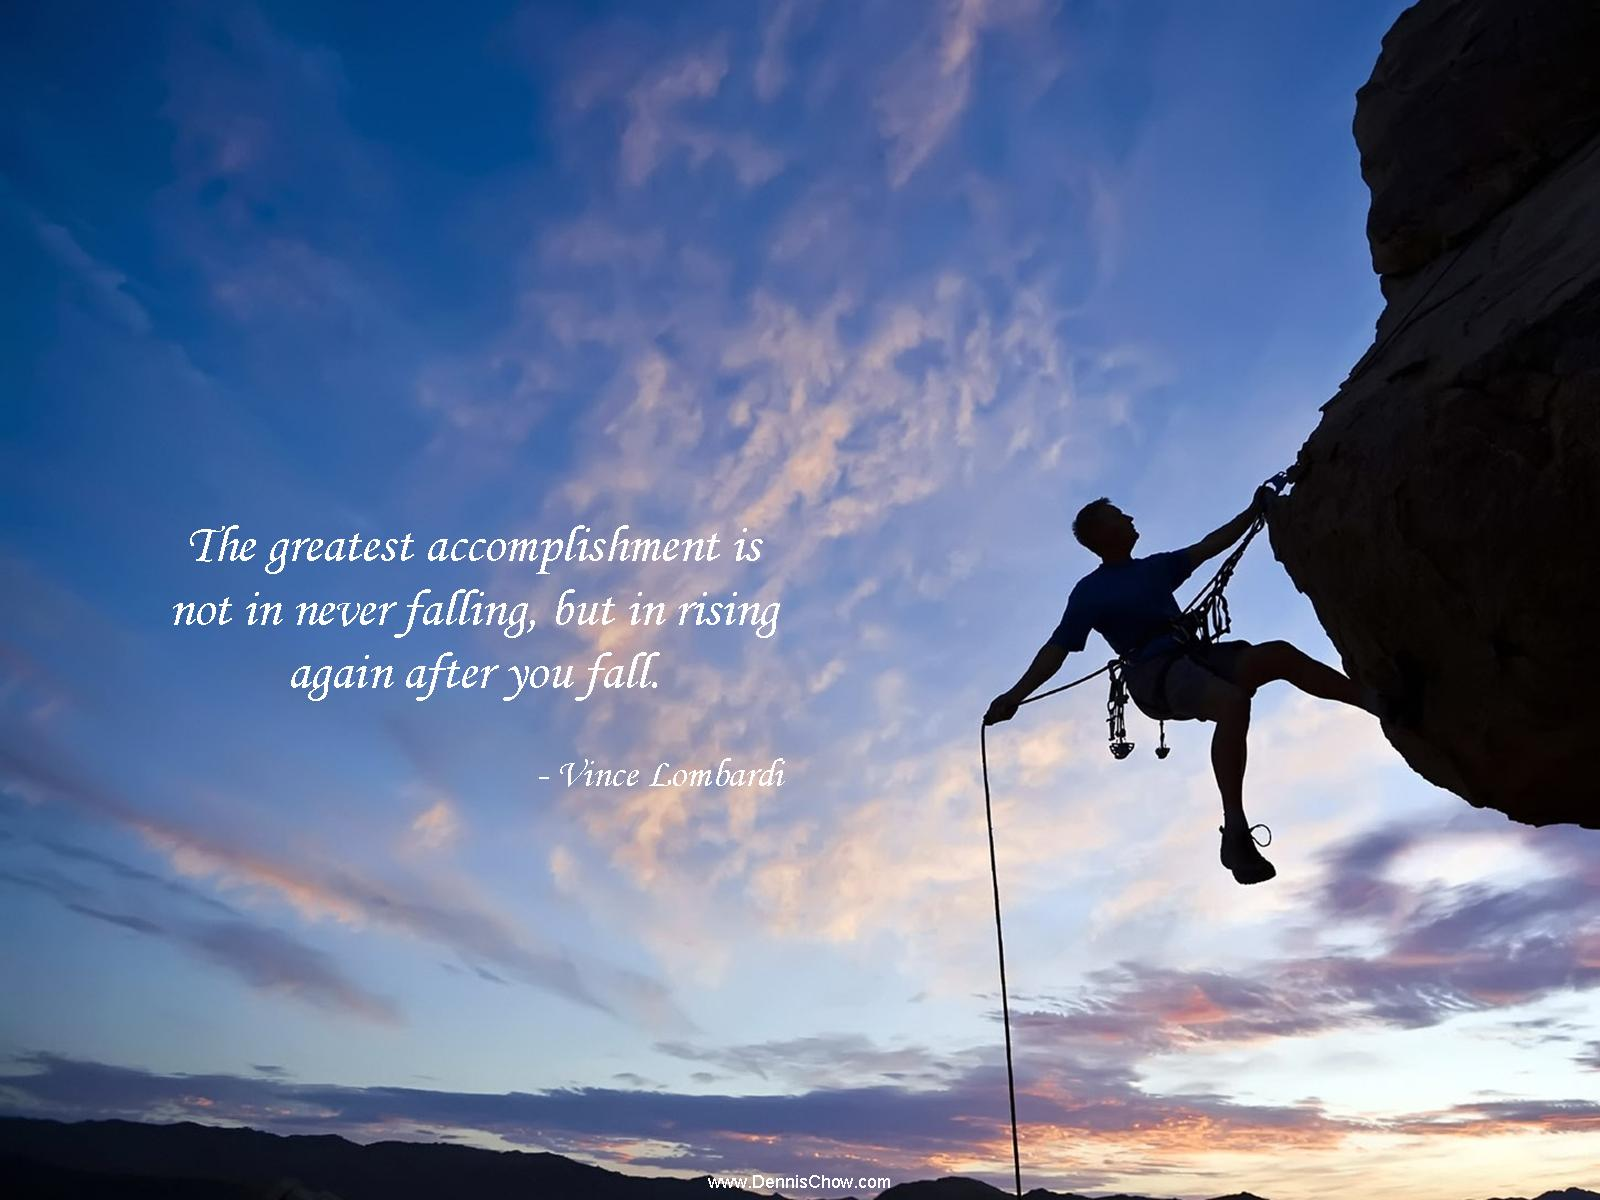 inspirational wallpaper quotes - hd desktop wallpapers